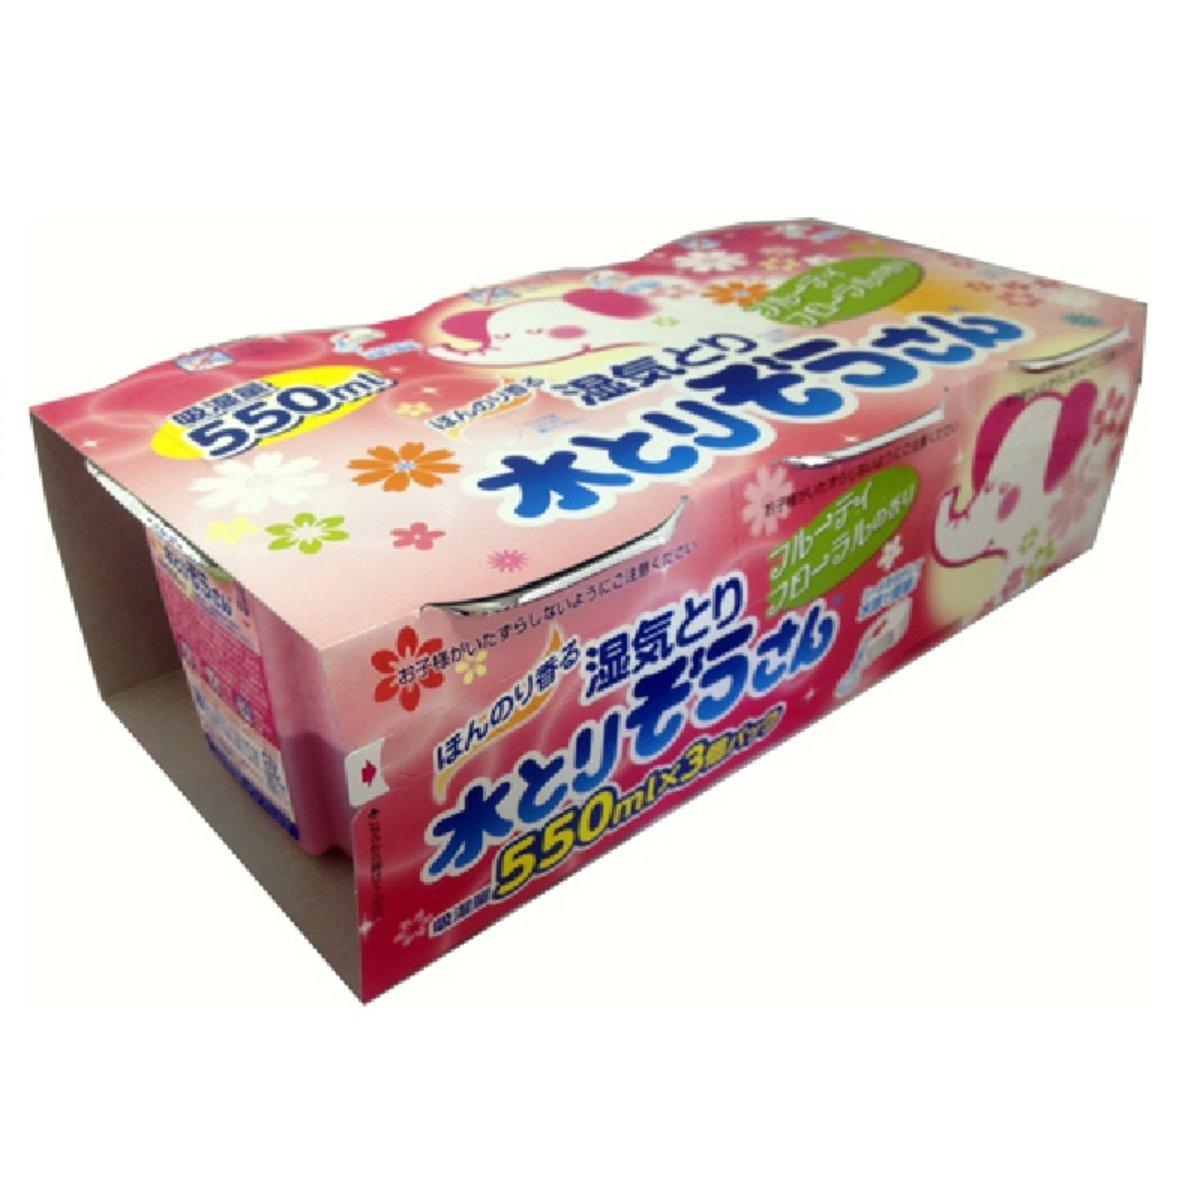 Okamoto 壁櫥櫥櫃衣櫃消臭除濕劑(粉) #花香 550mlX3